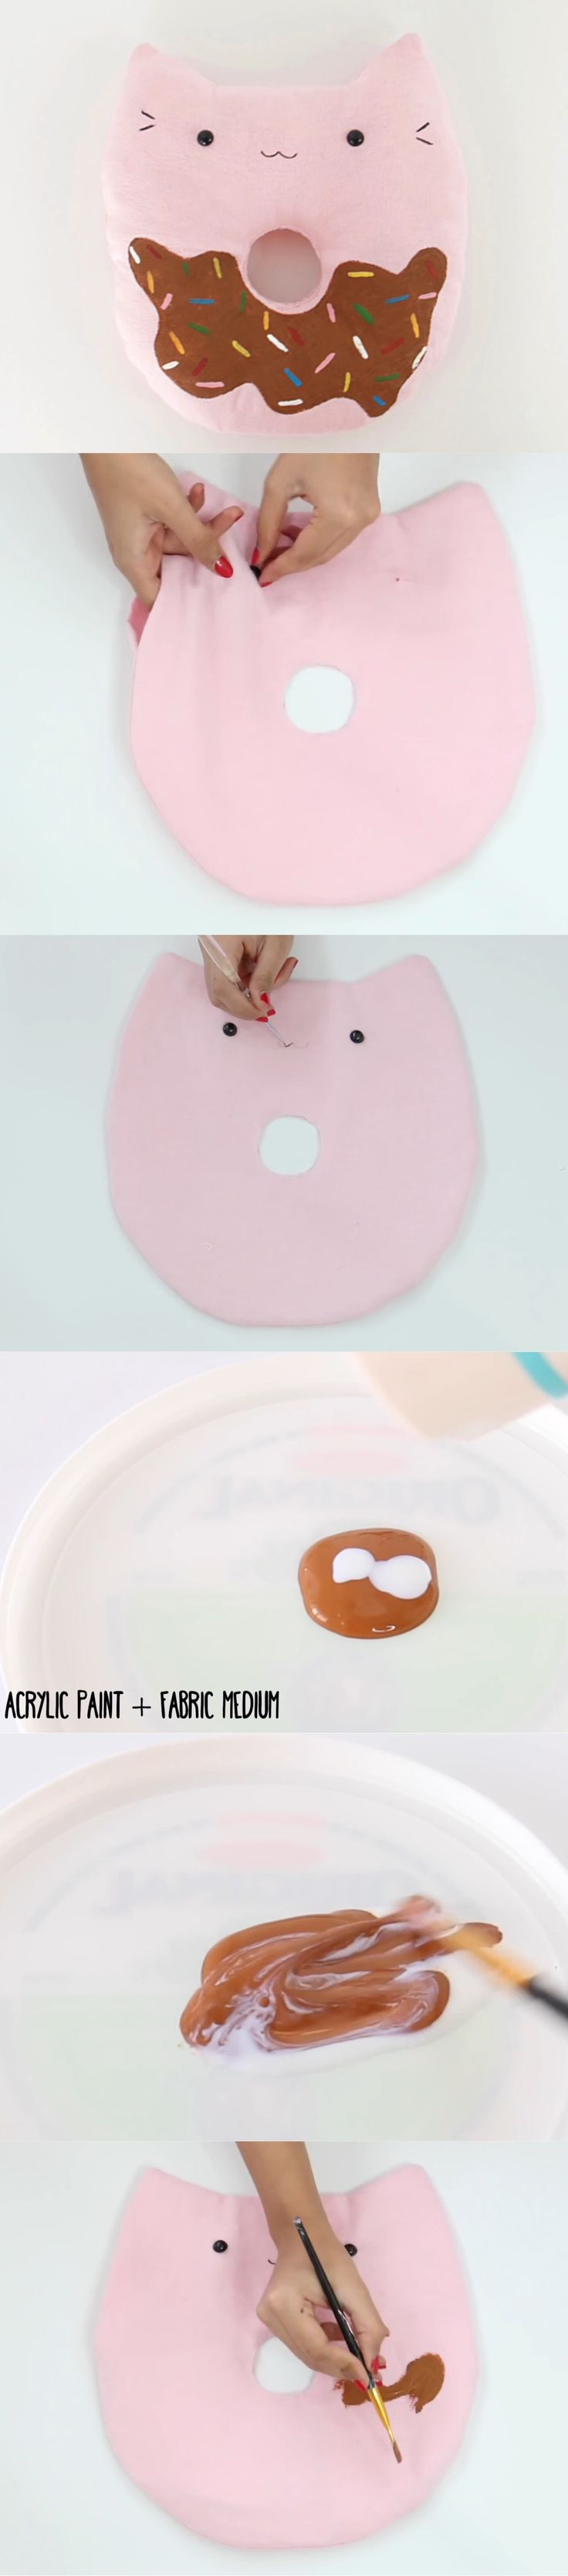 Cat/Donut Pillow Part 3|Nim C